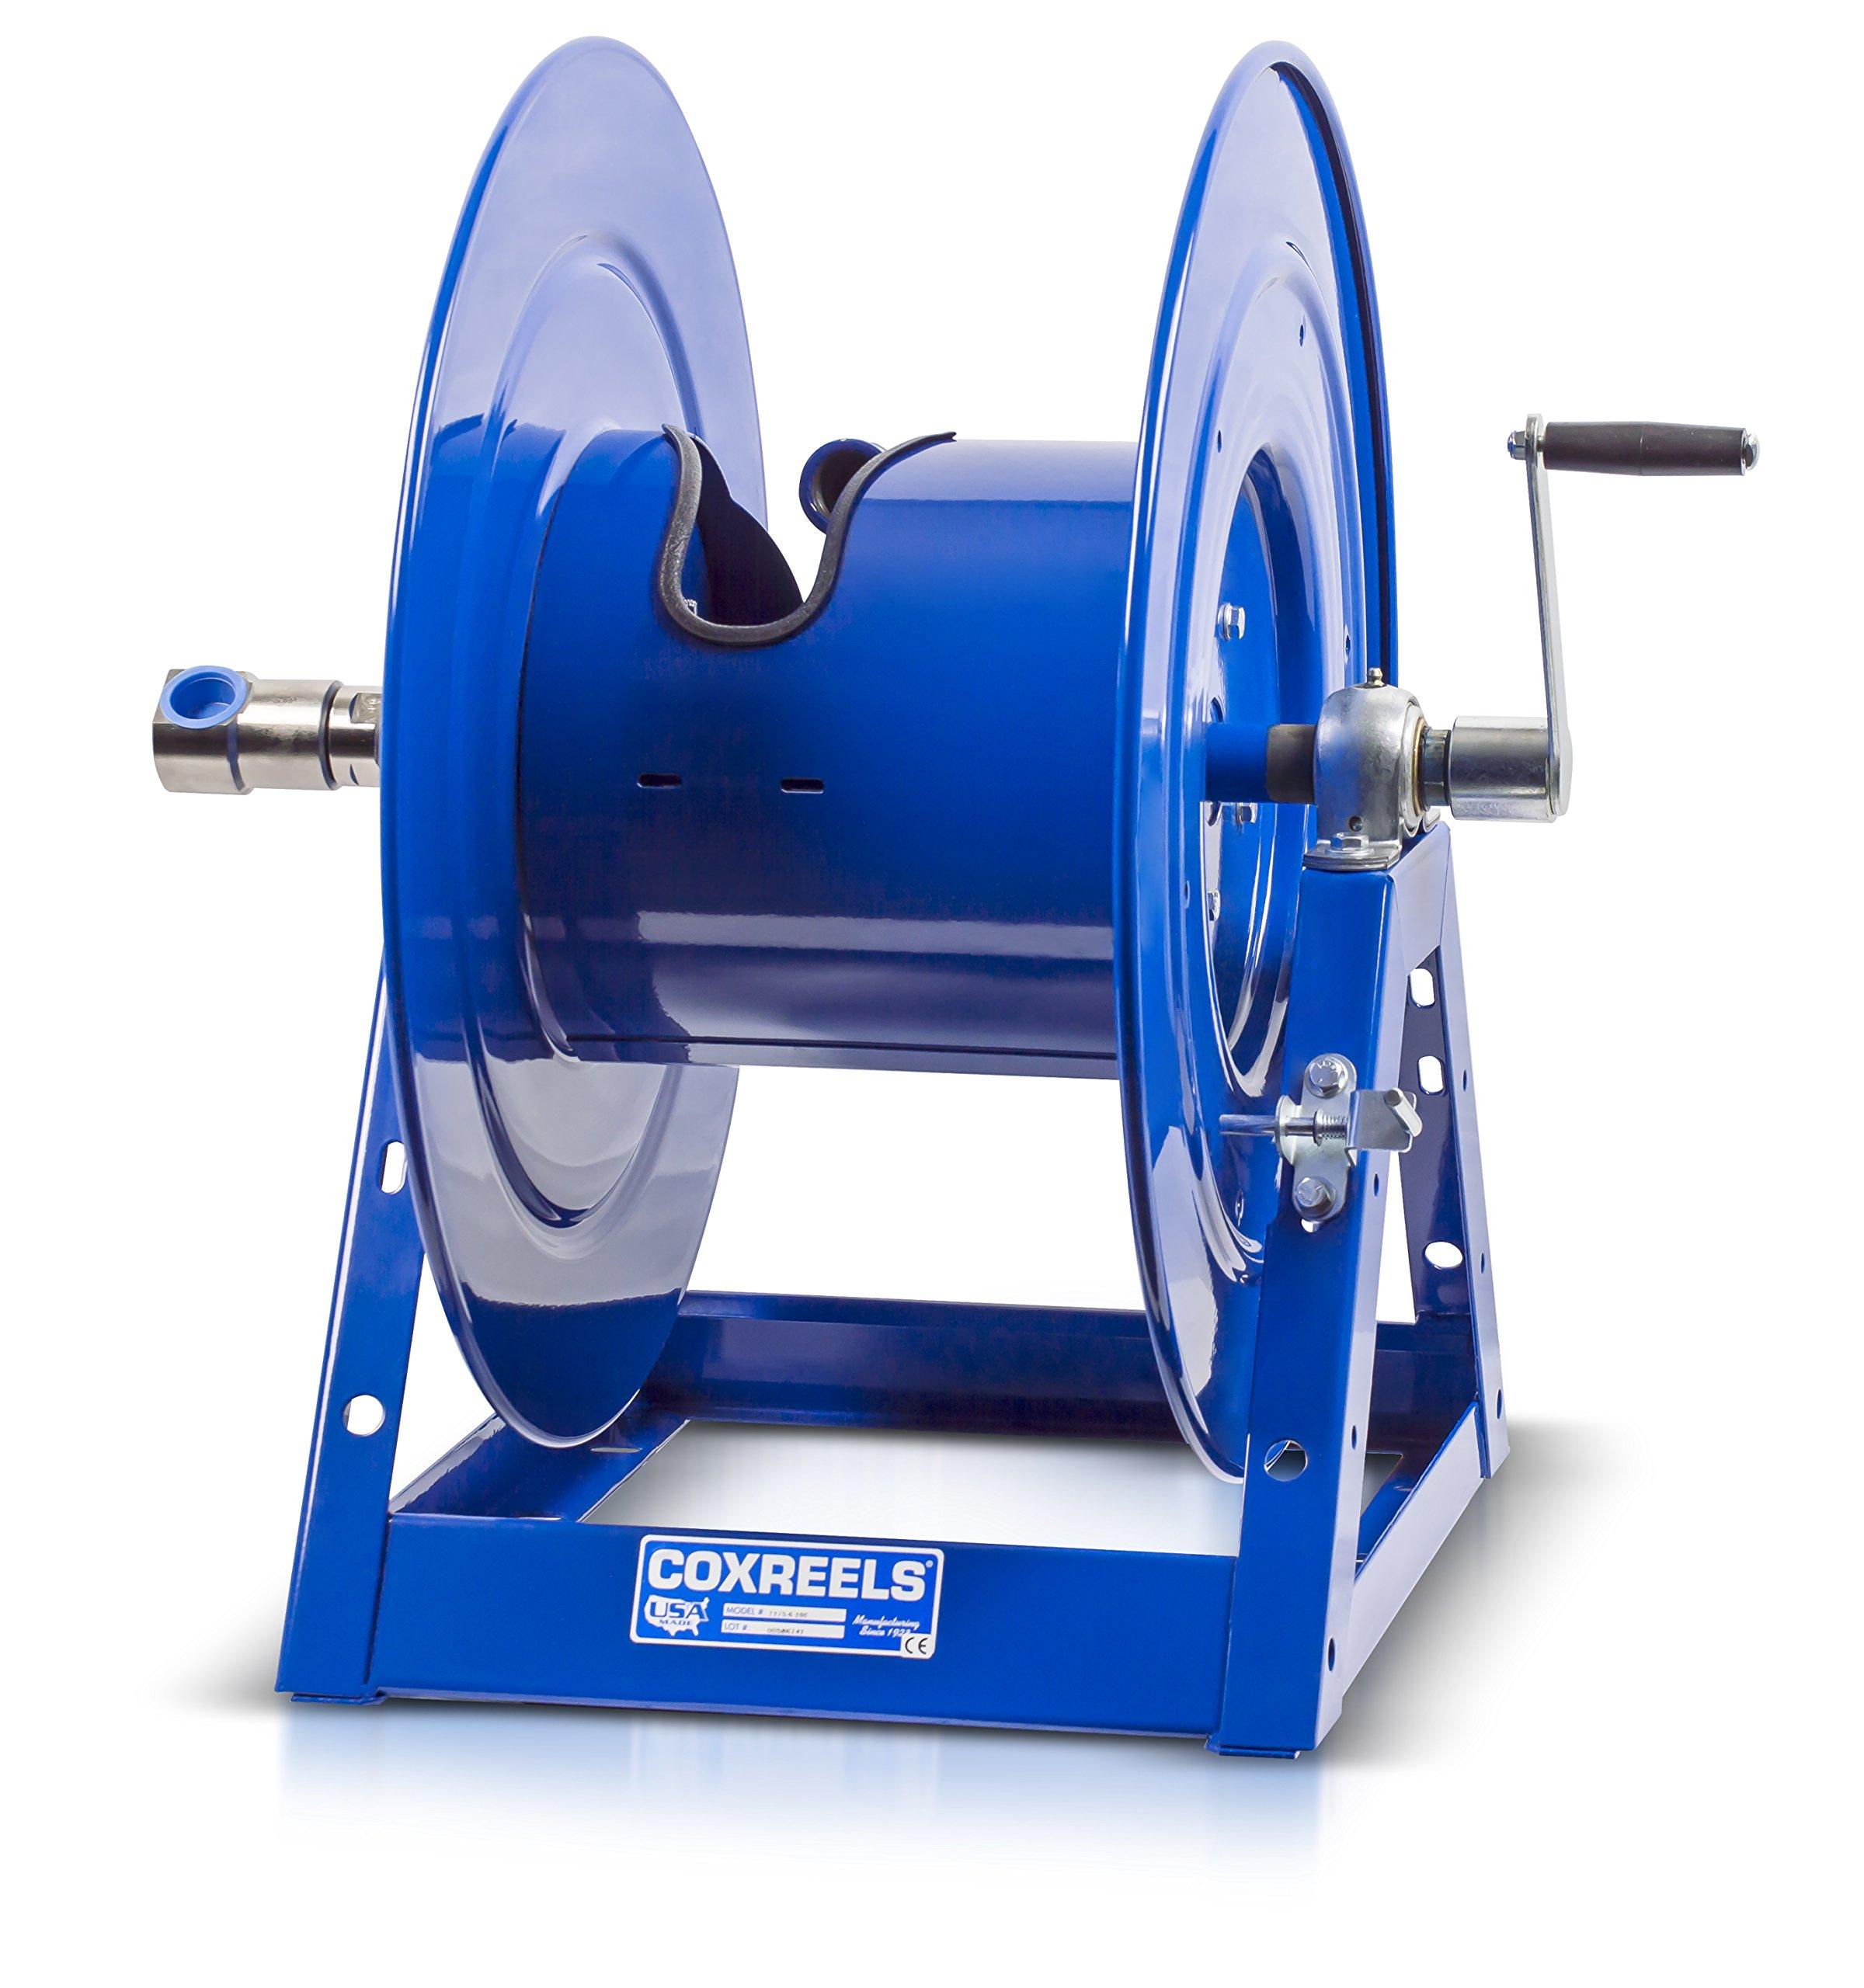 Coxreels 1175-6-100 Hand Crank Hose Reel: 1'' I.D, 100' hose capacity, less hose, 3000 PSI